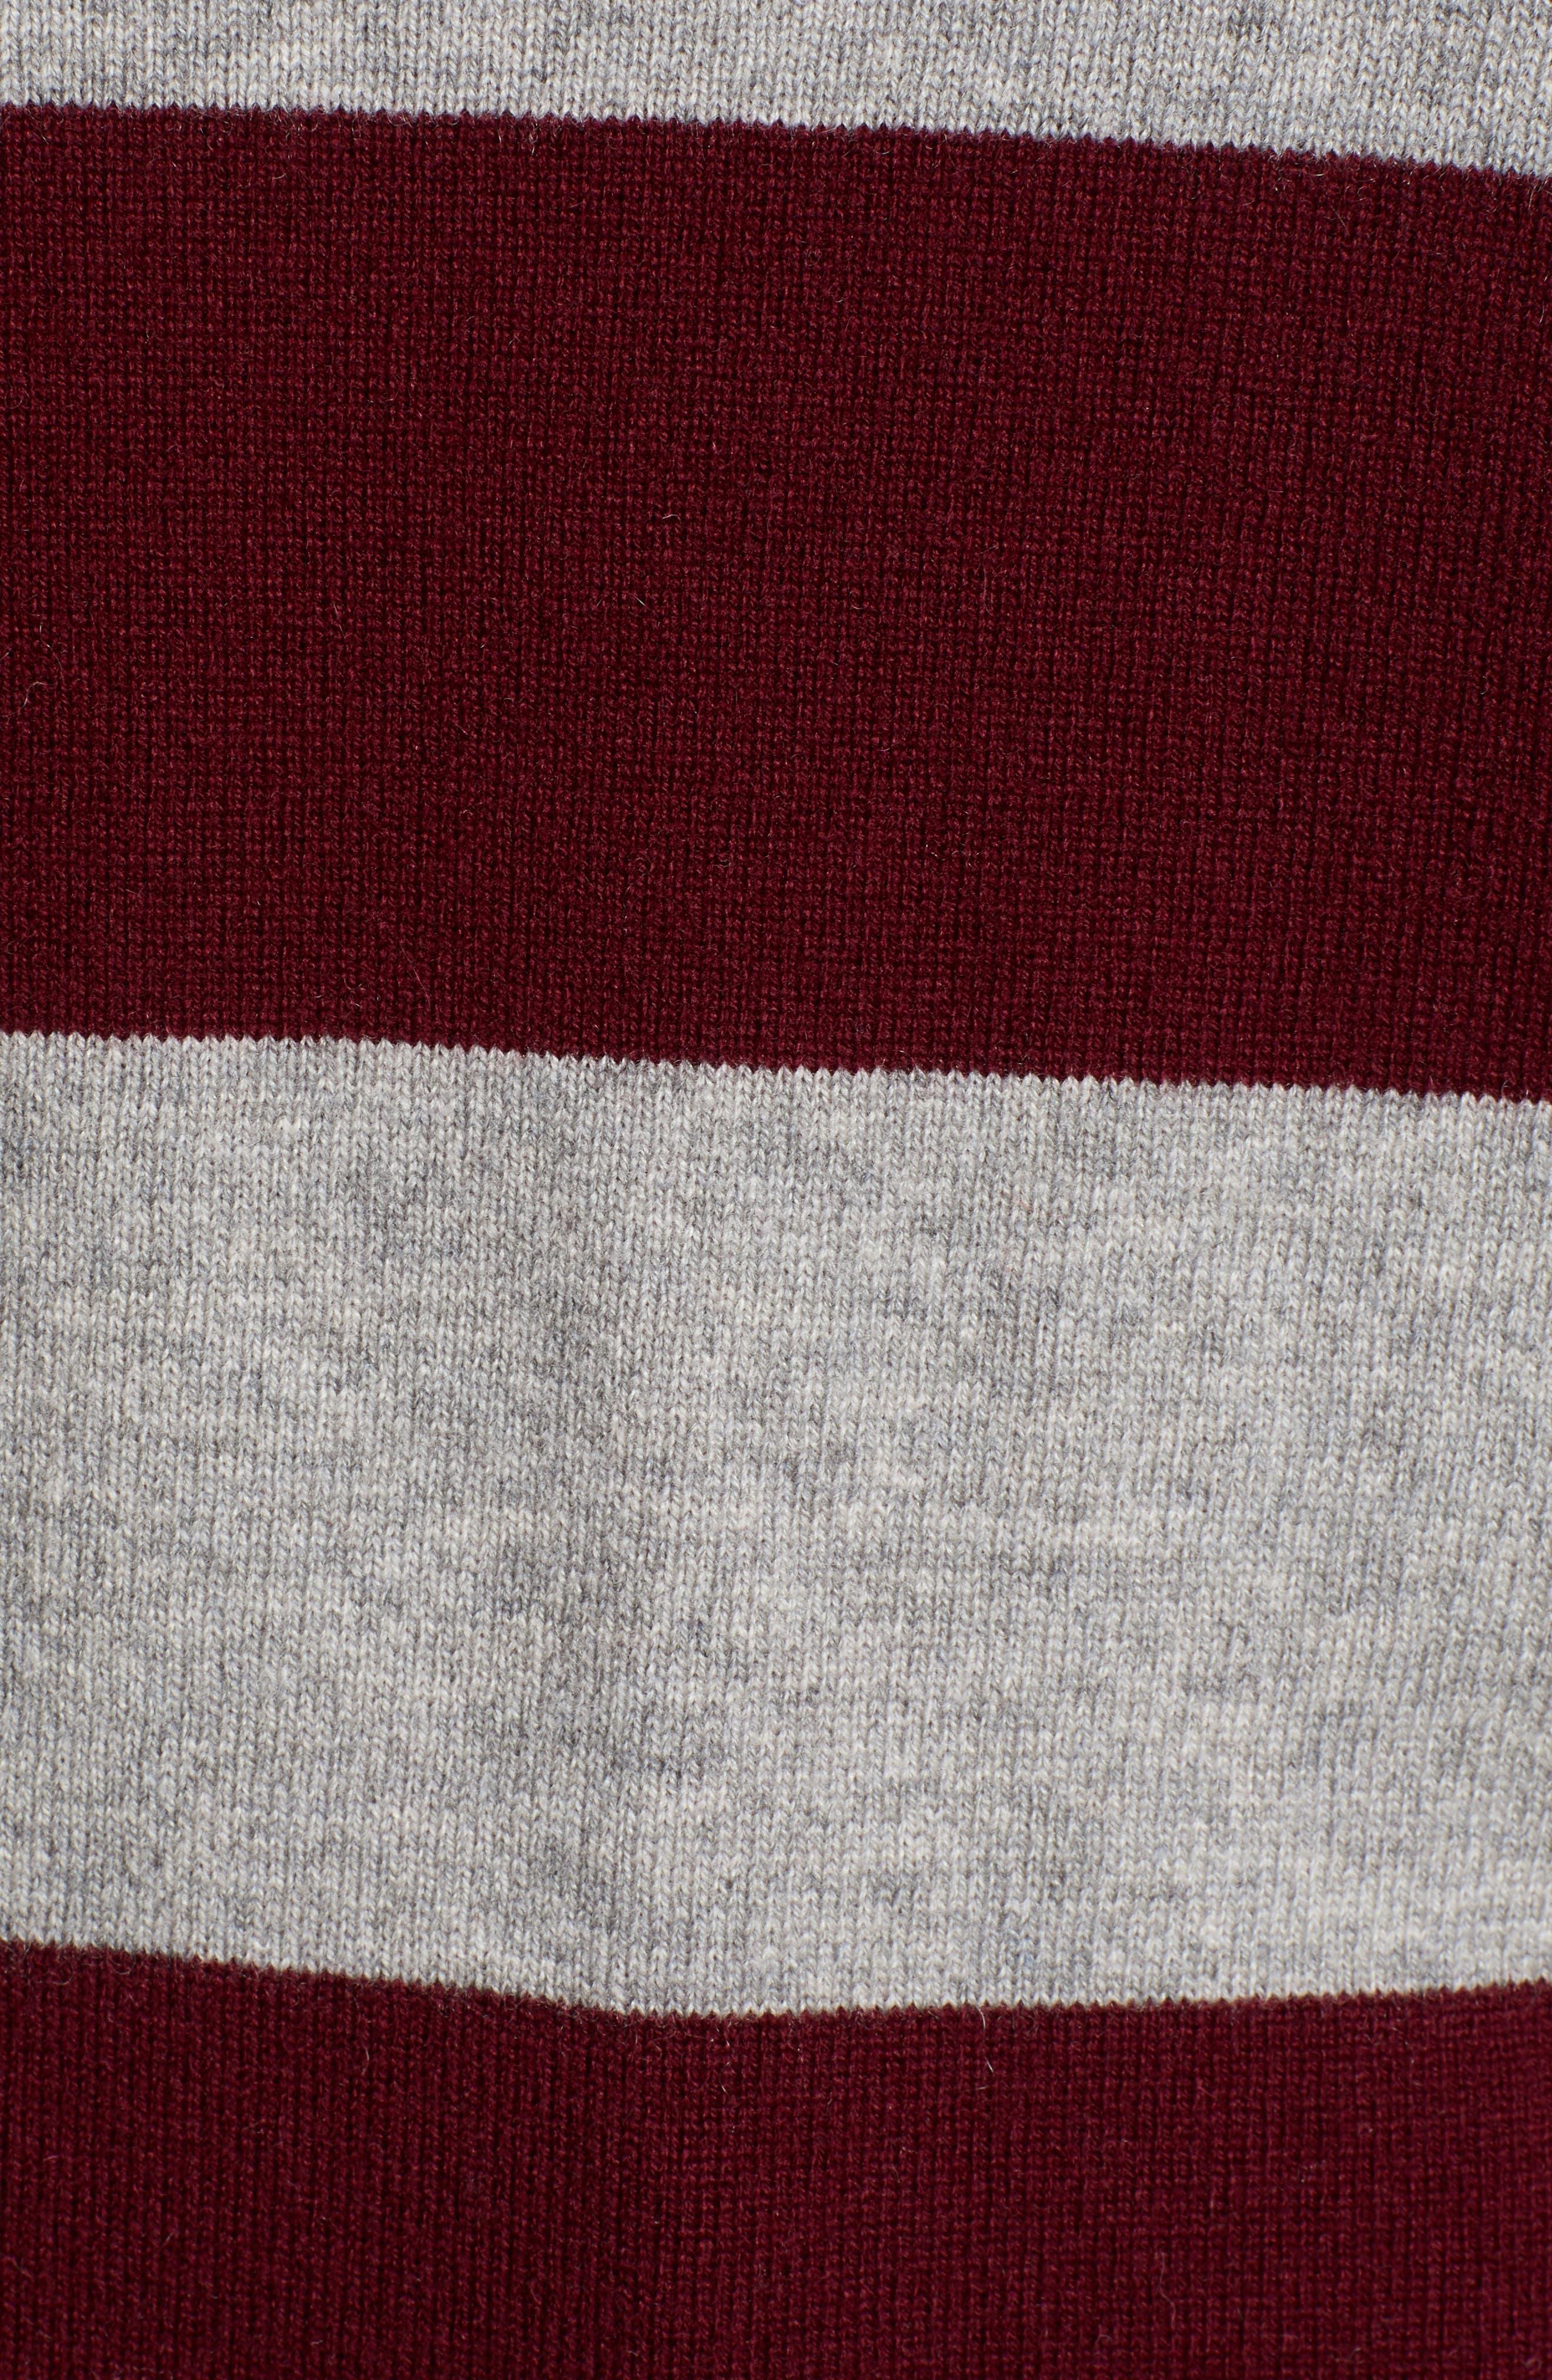 Tara Stripe Cashmere Sweater,                             Alternate thumbnail 5, color,                             DARK RED/ HEATHER GREY